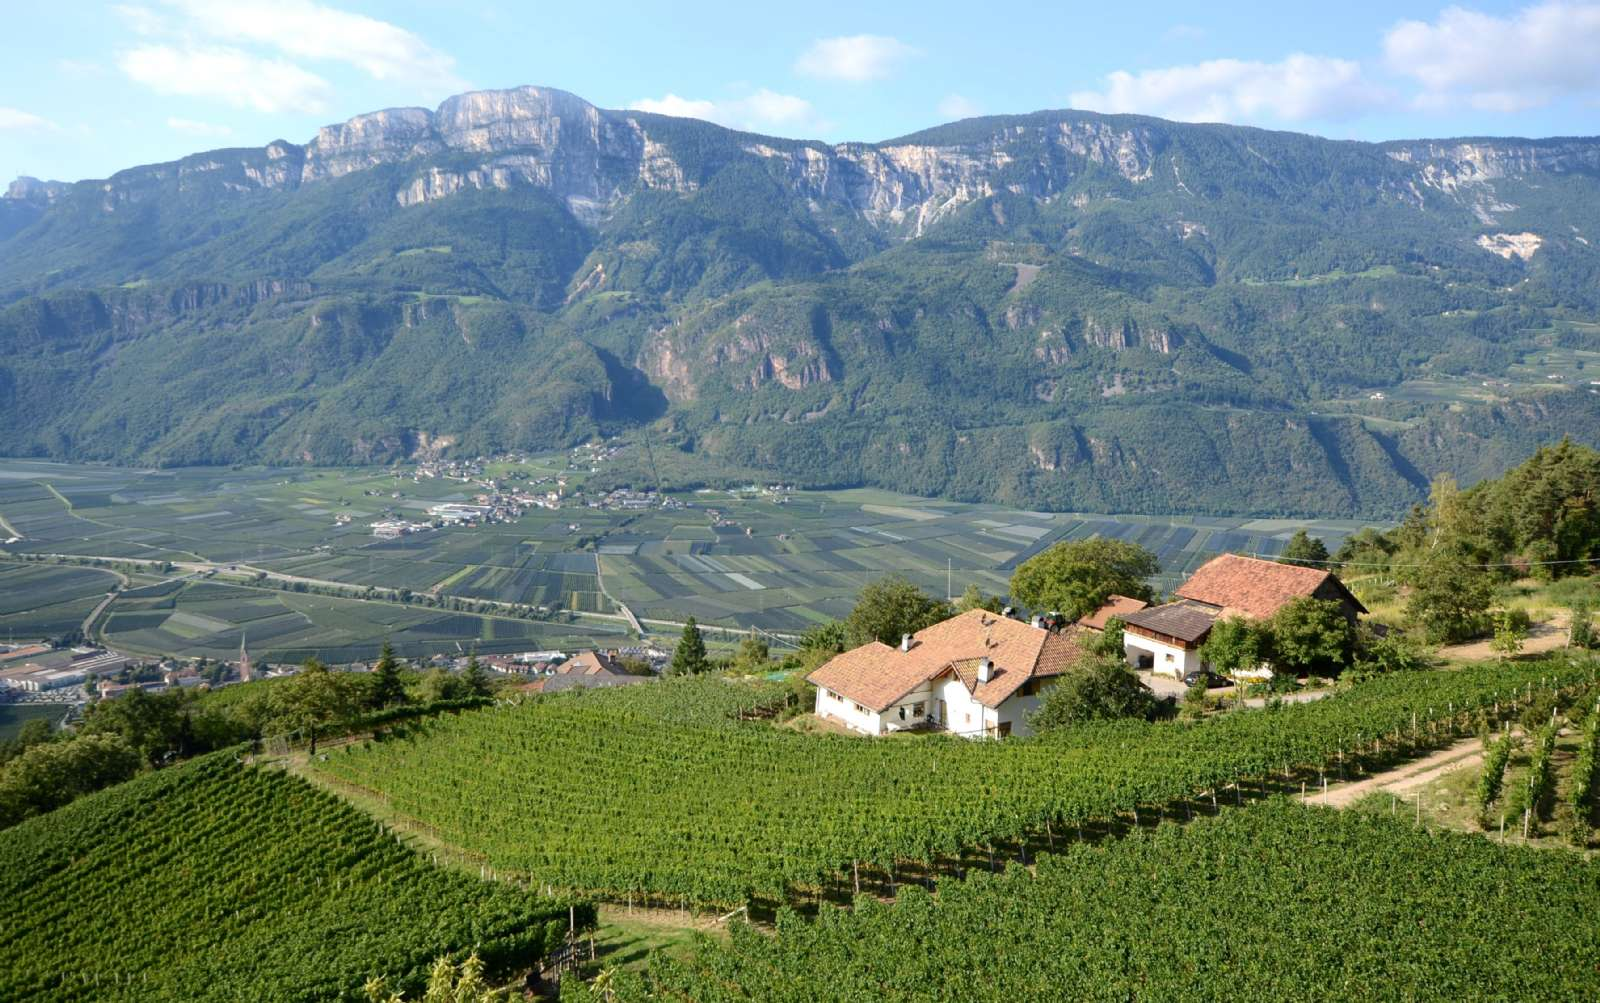 Le vignoble entre Bolzano et Trente, à Caldaro